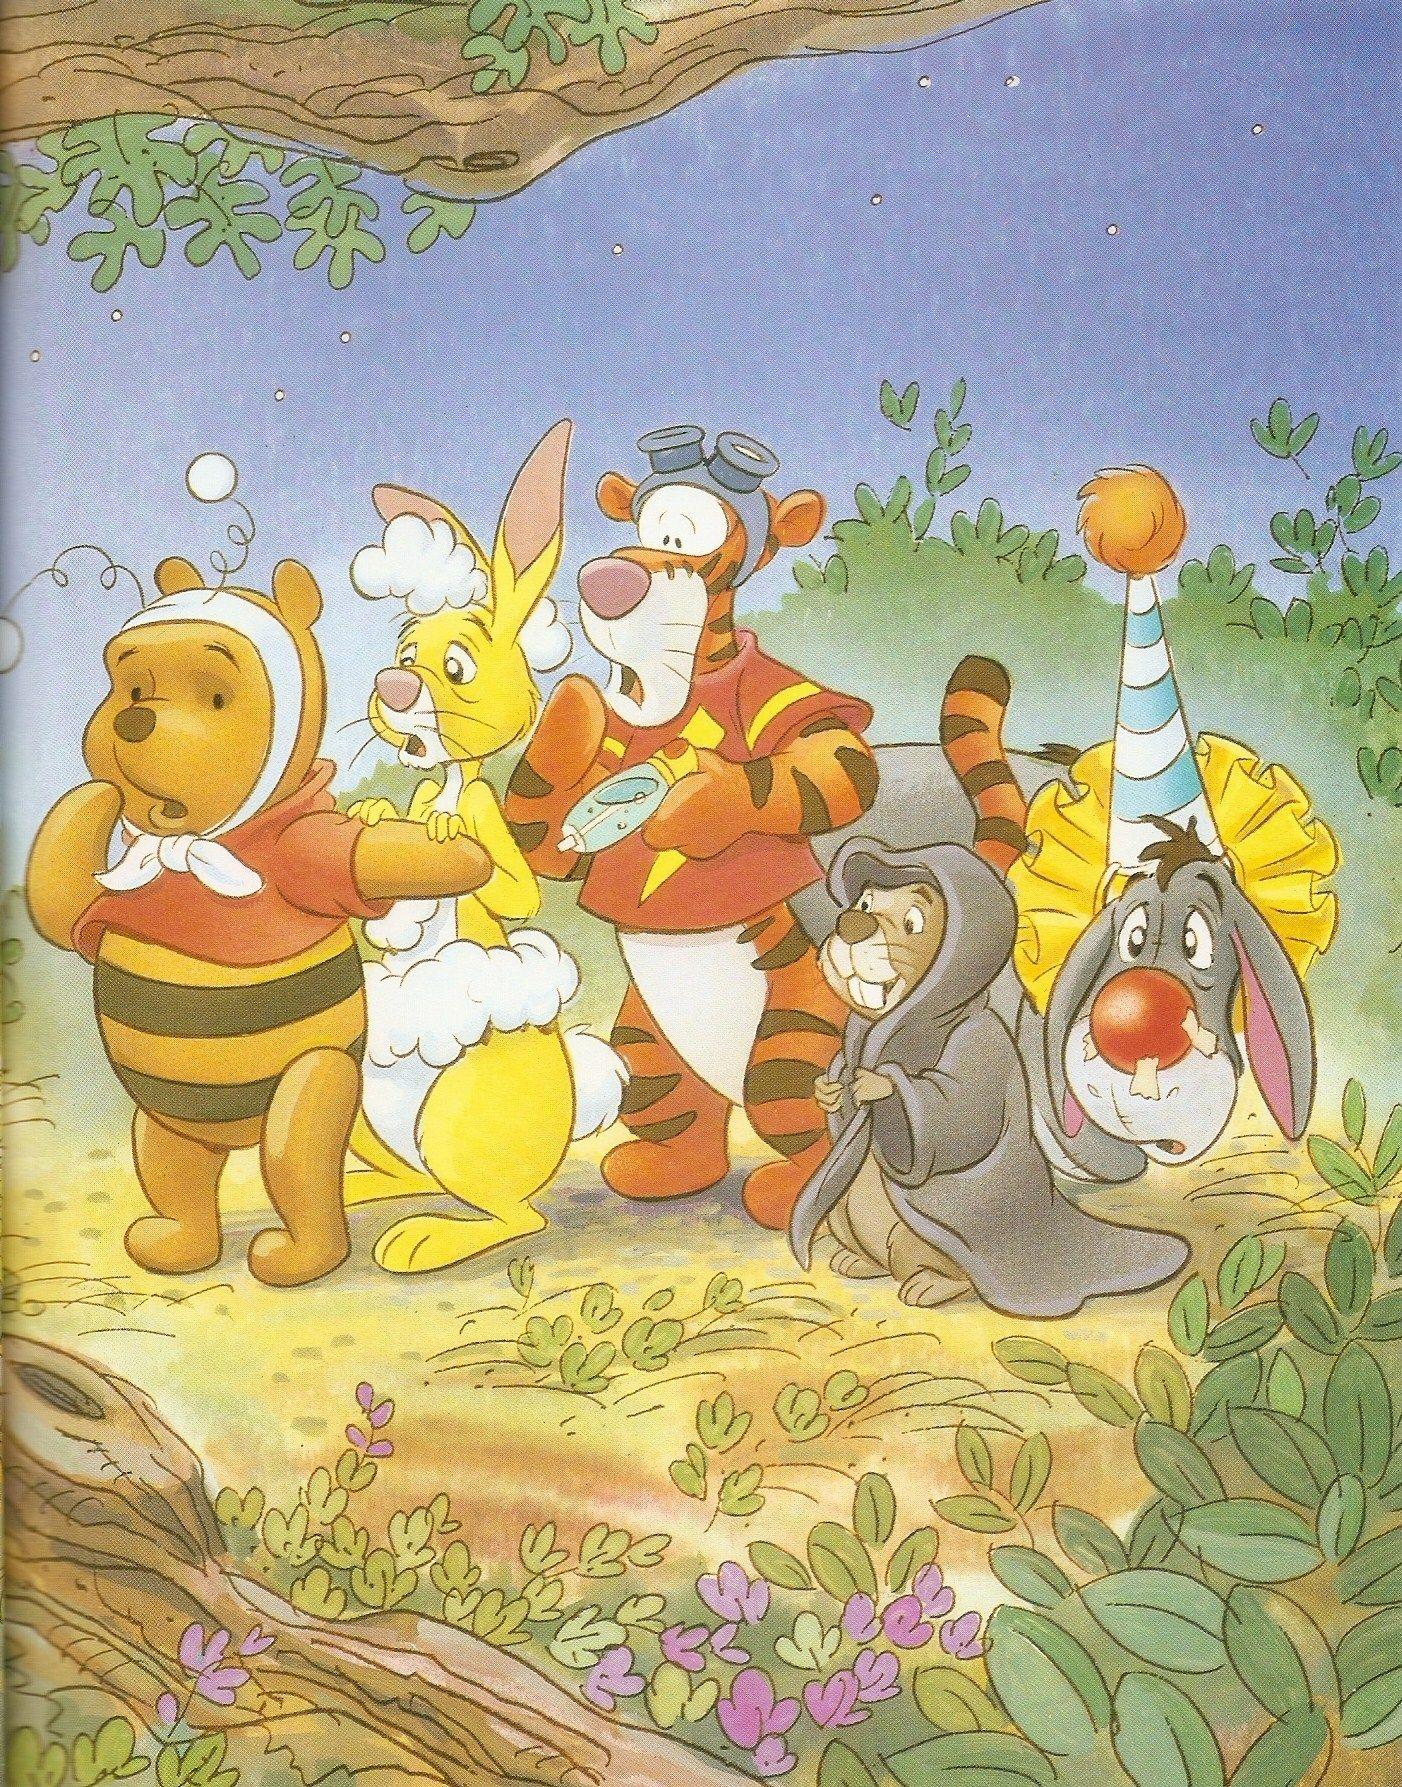 Winnie The Pooh S Halloween 25 Winnie The Pooh Halloween Winnie The Pooh Pictures Cute Winnie The Pooh